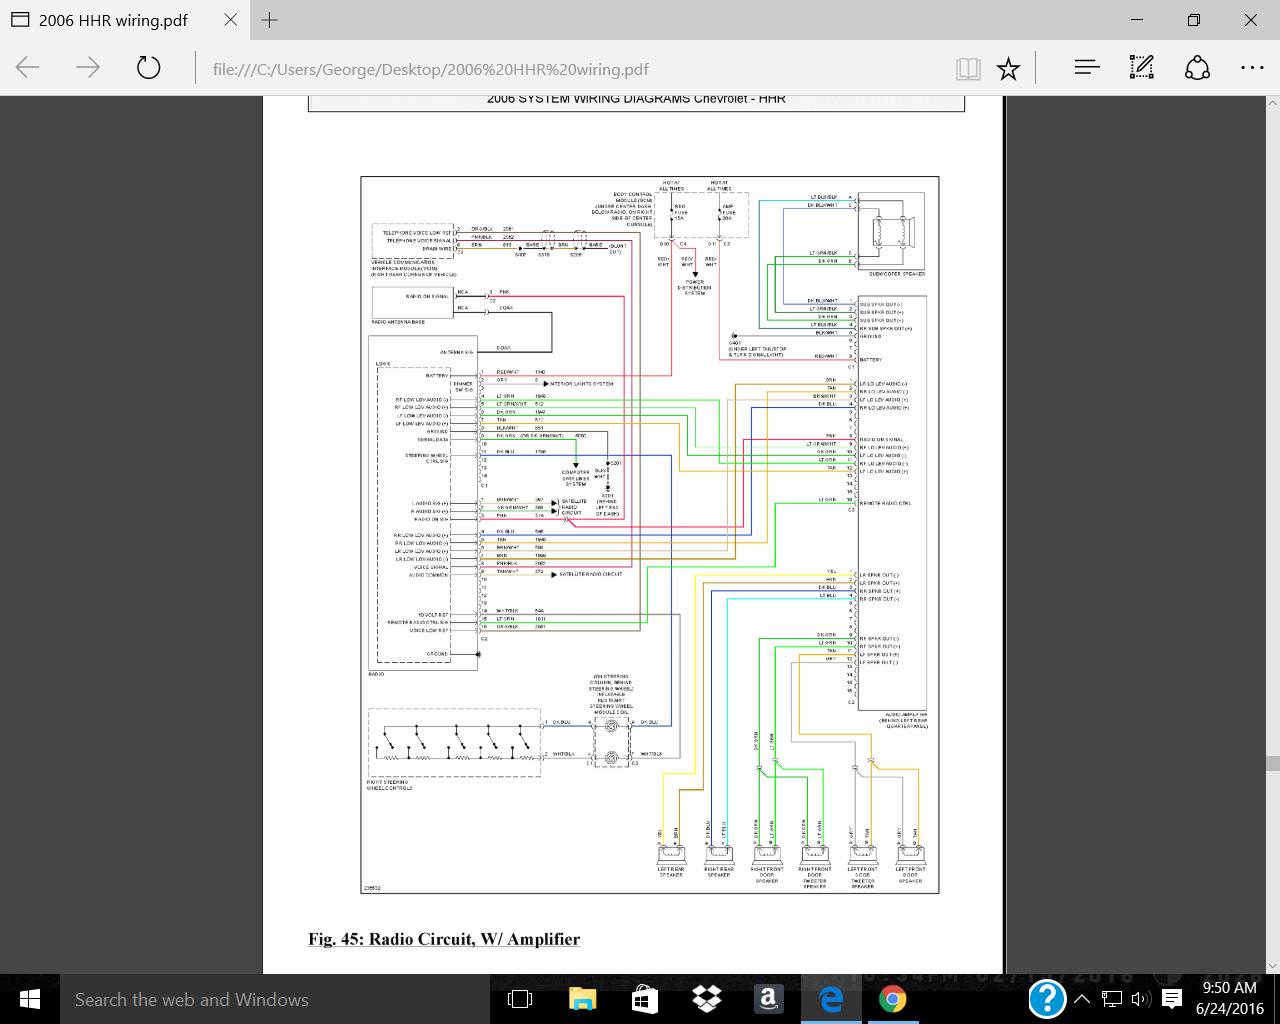 2006 hhr stereo wiring diagram